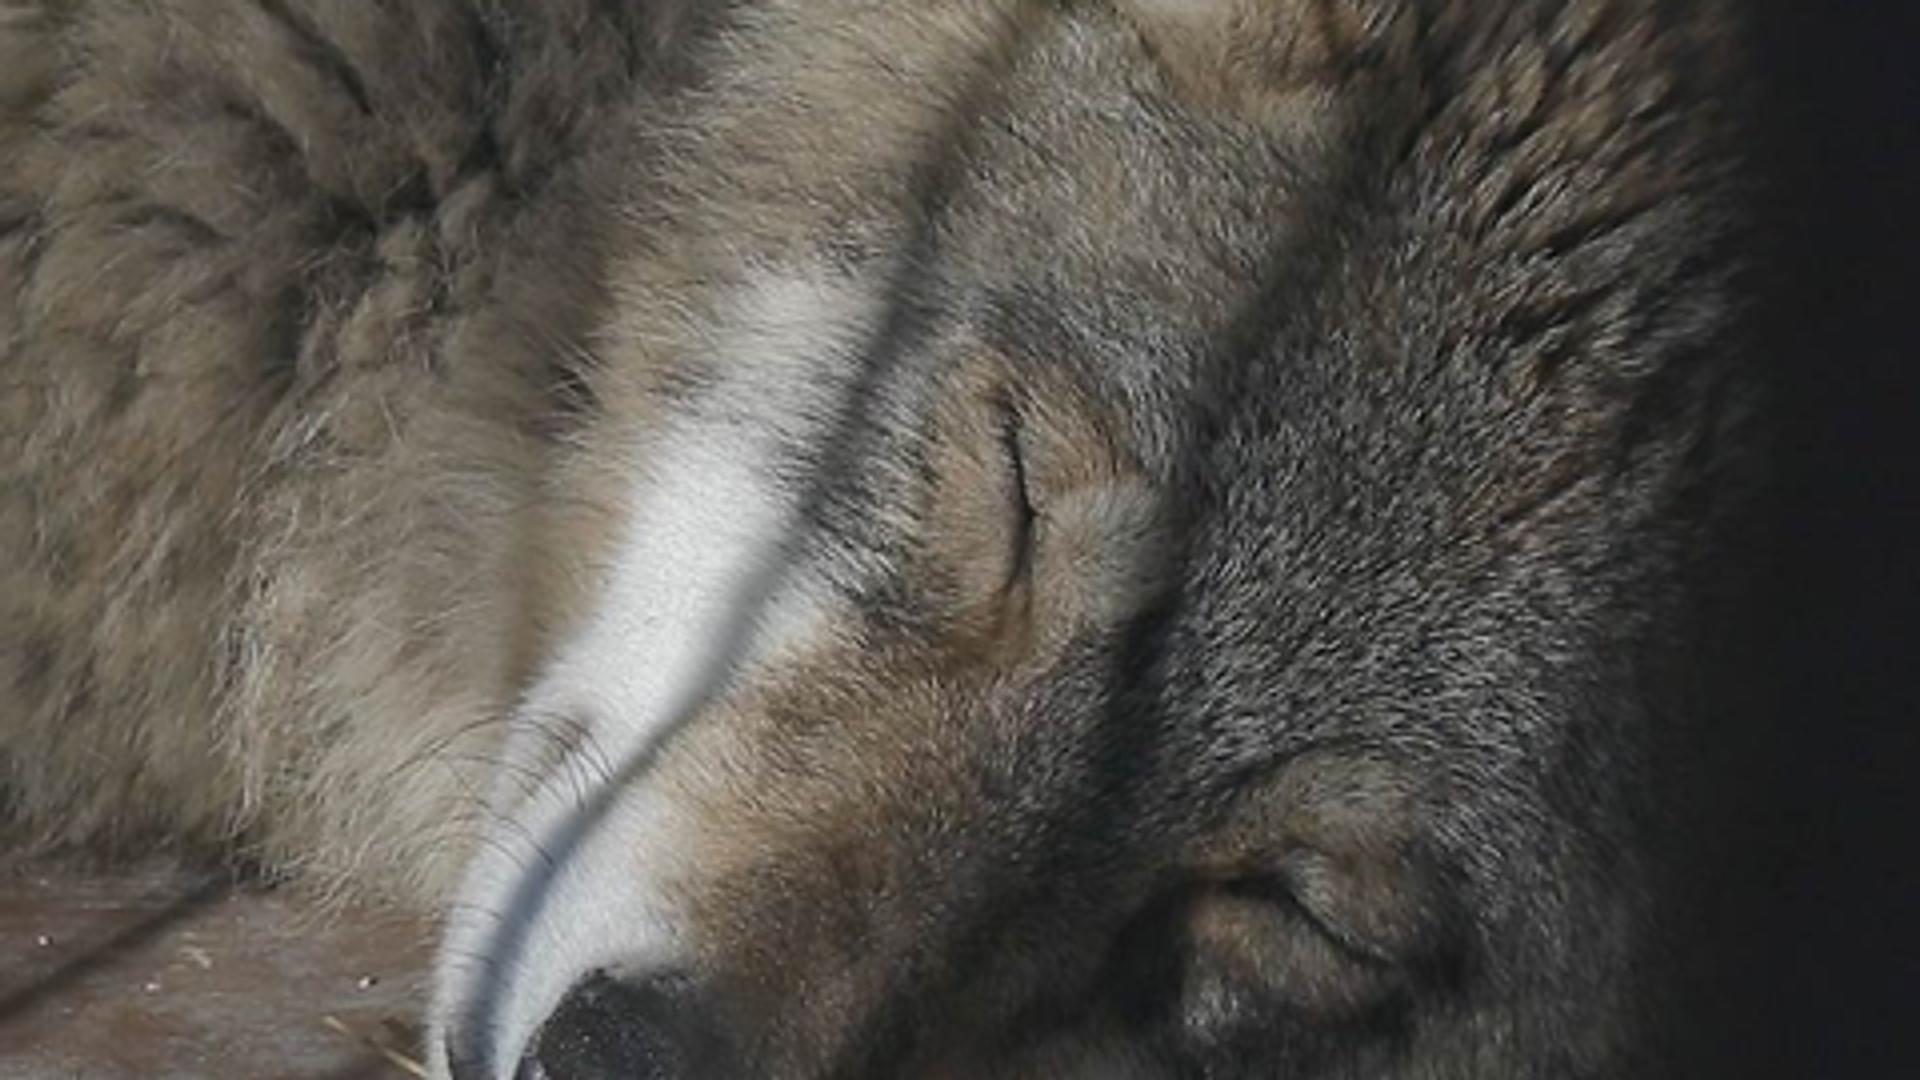 Un lobo del santuario de Andréi Musienko - Sputnik Mundo, 1920, 07.04.2021